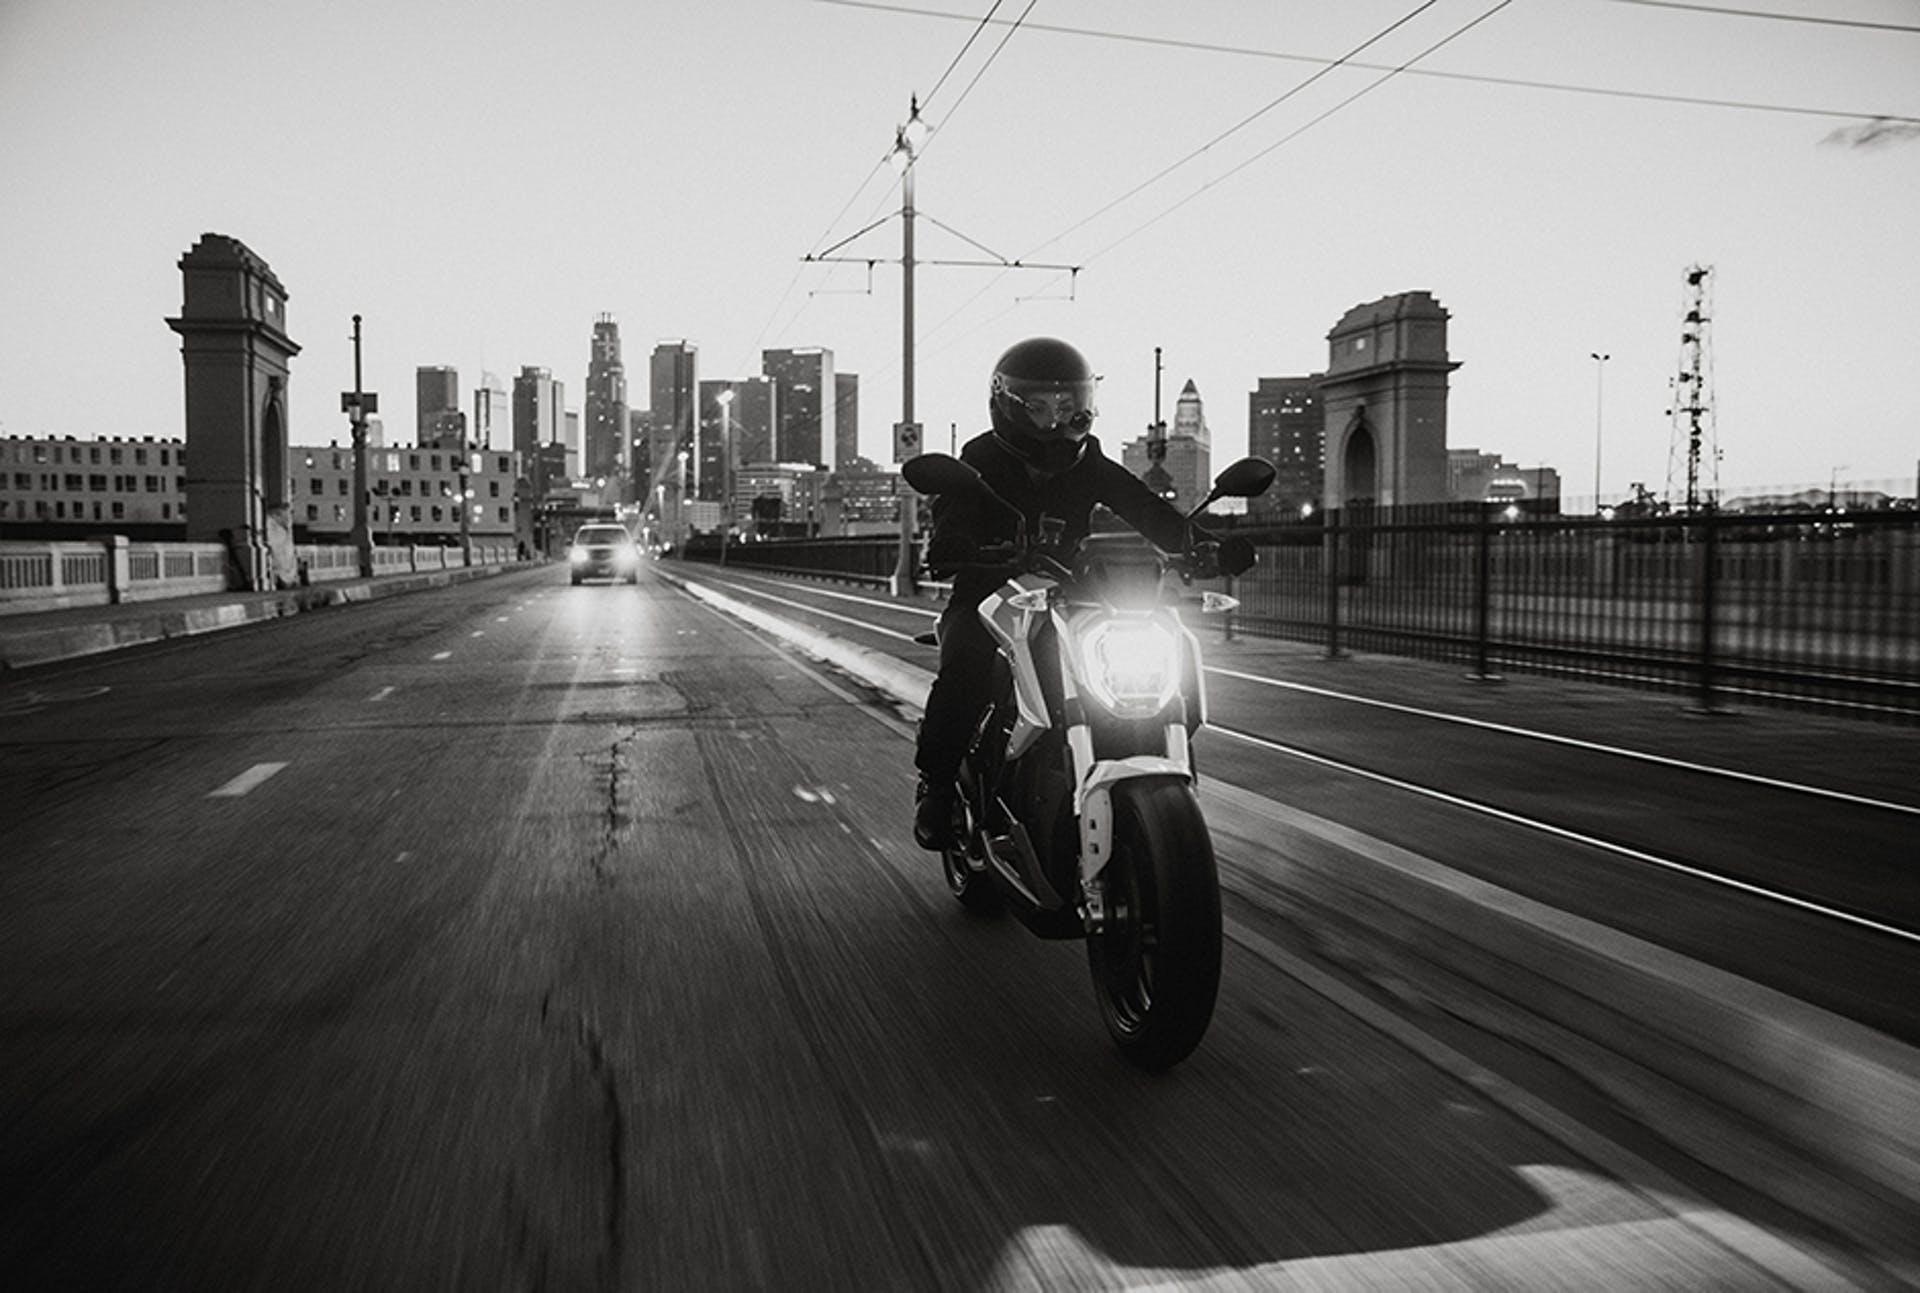 Man Riding the Zero SR/F Electric Motorcycle.